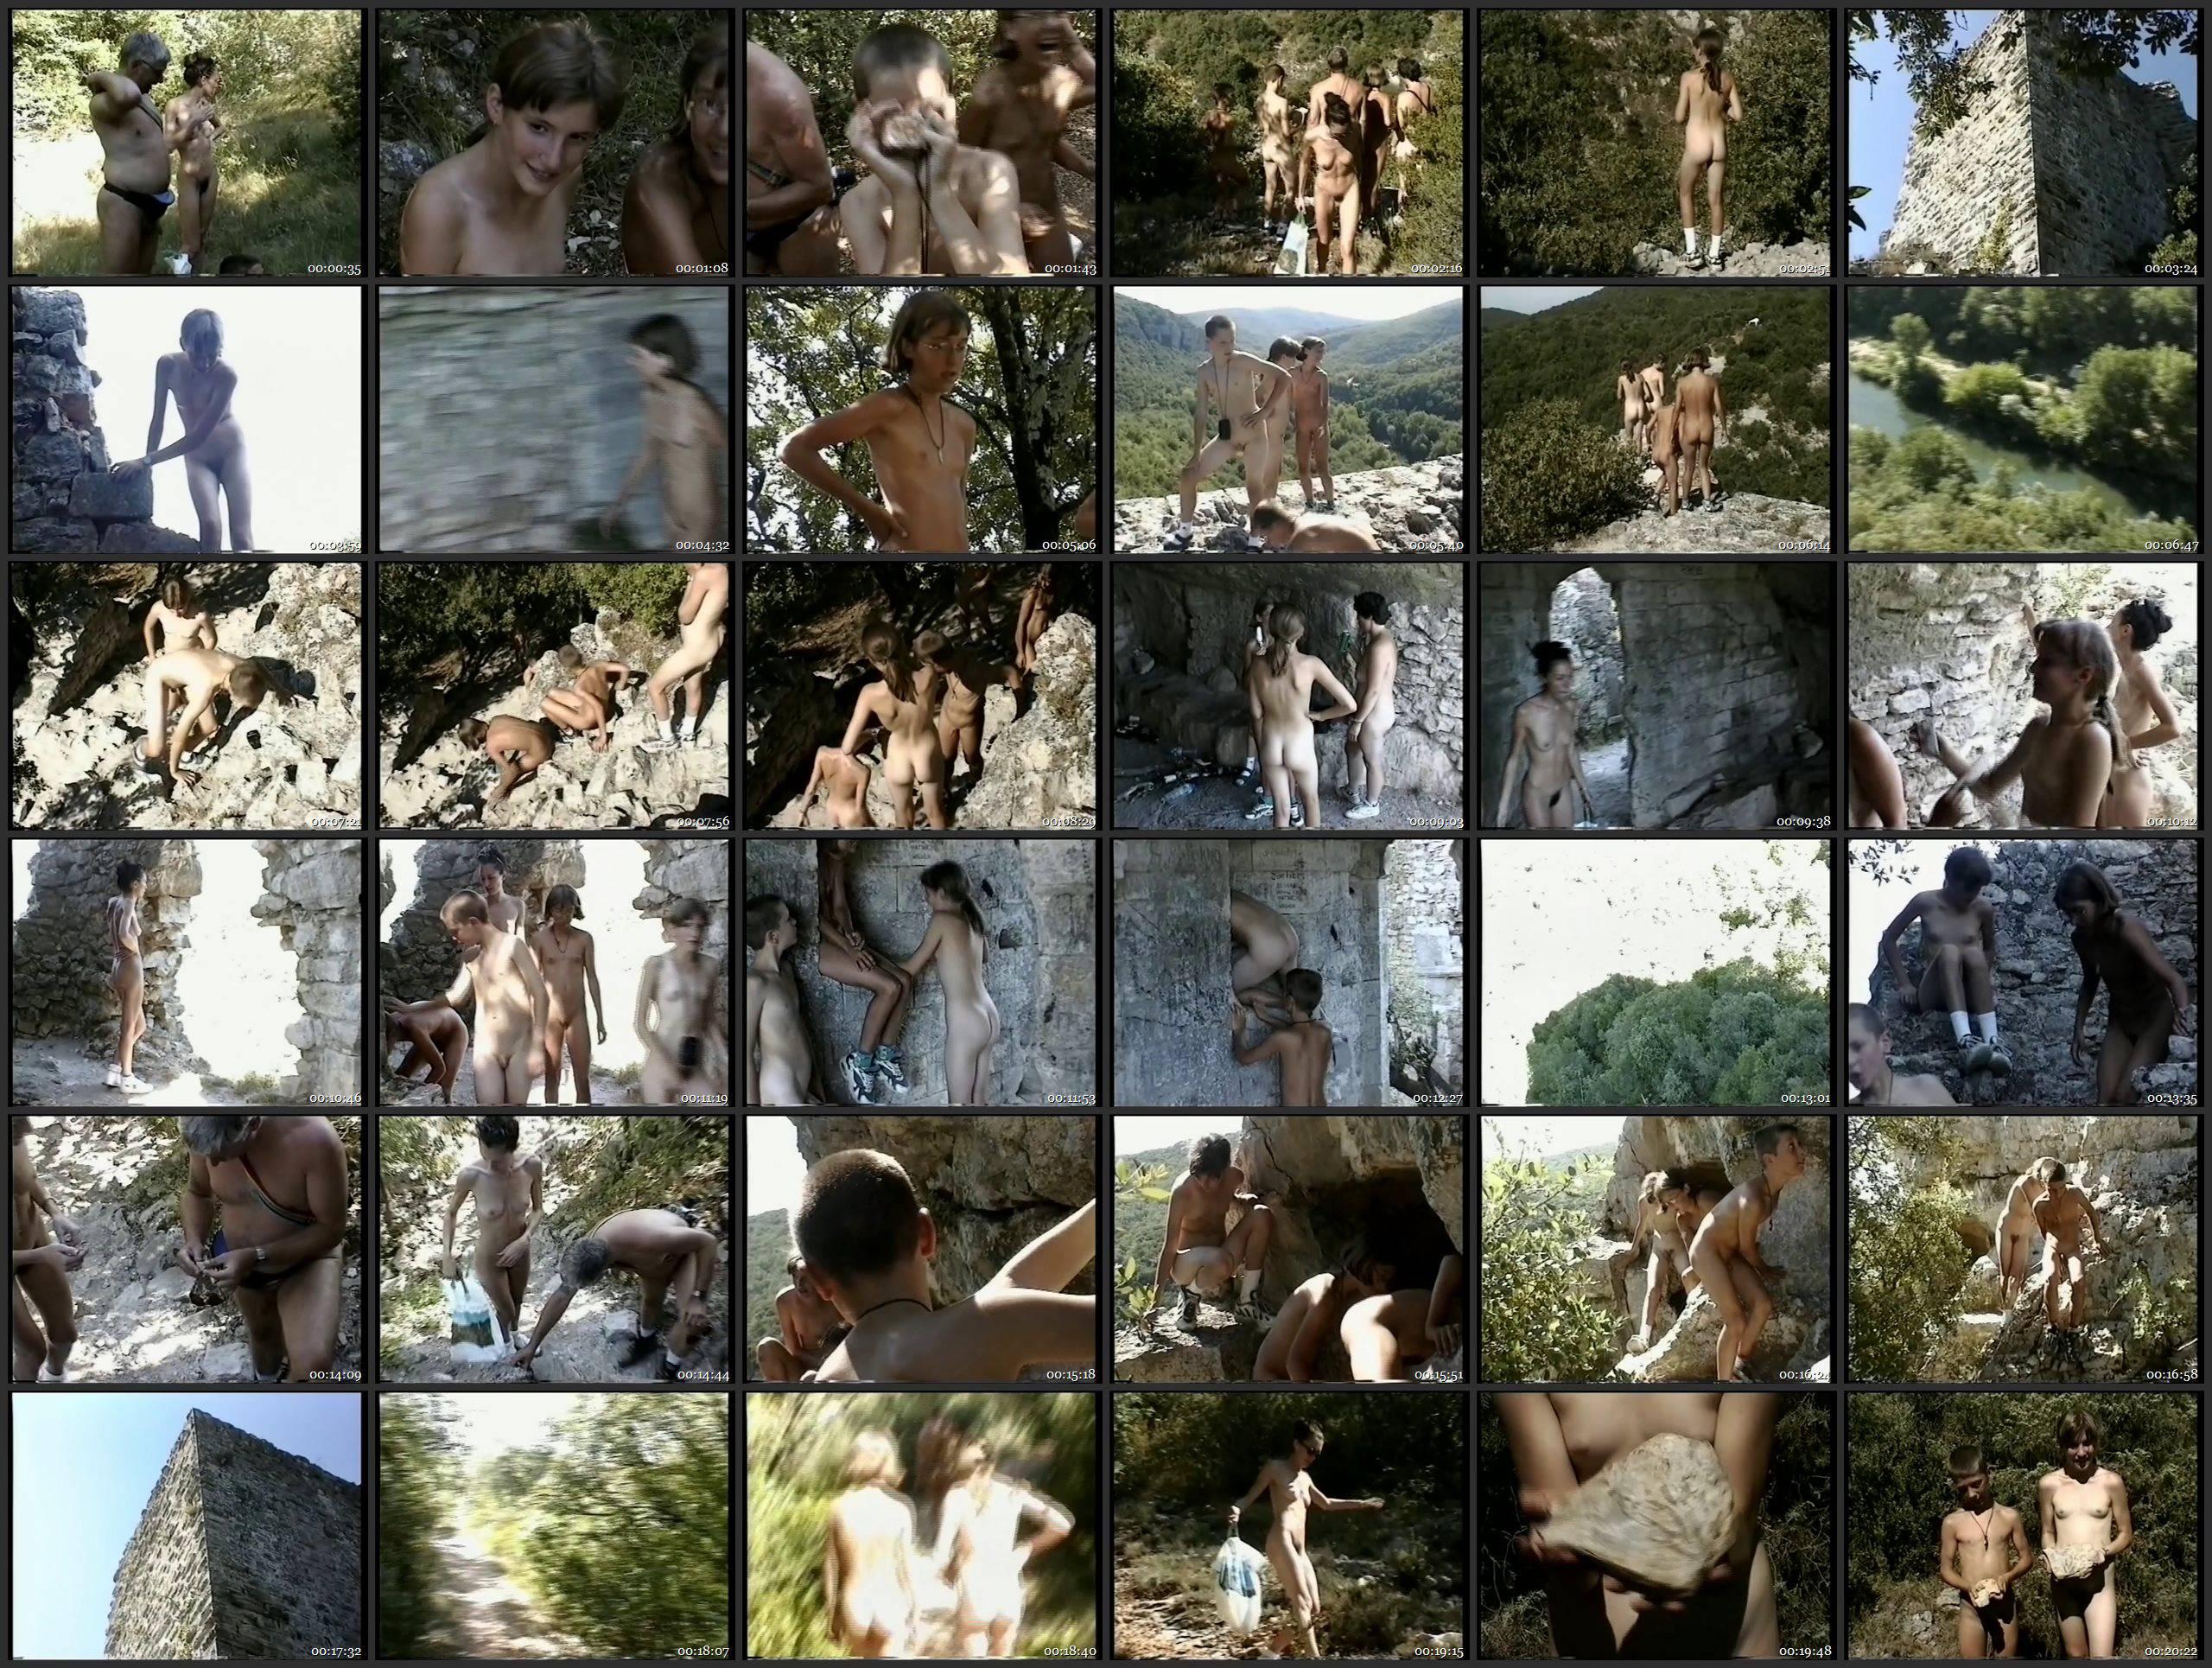 Roschelle In France 4 - Bonus Footage - Thumbnails